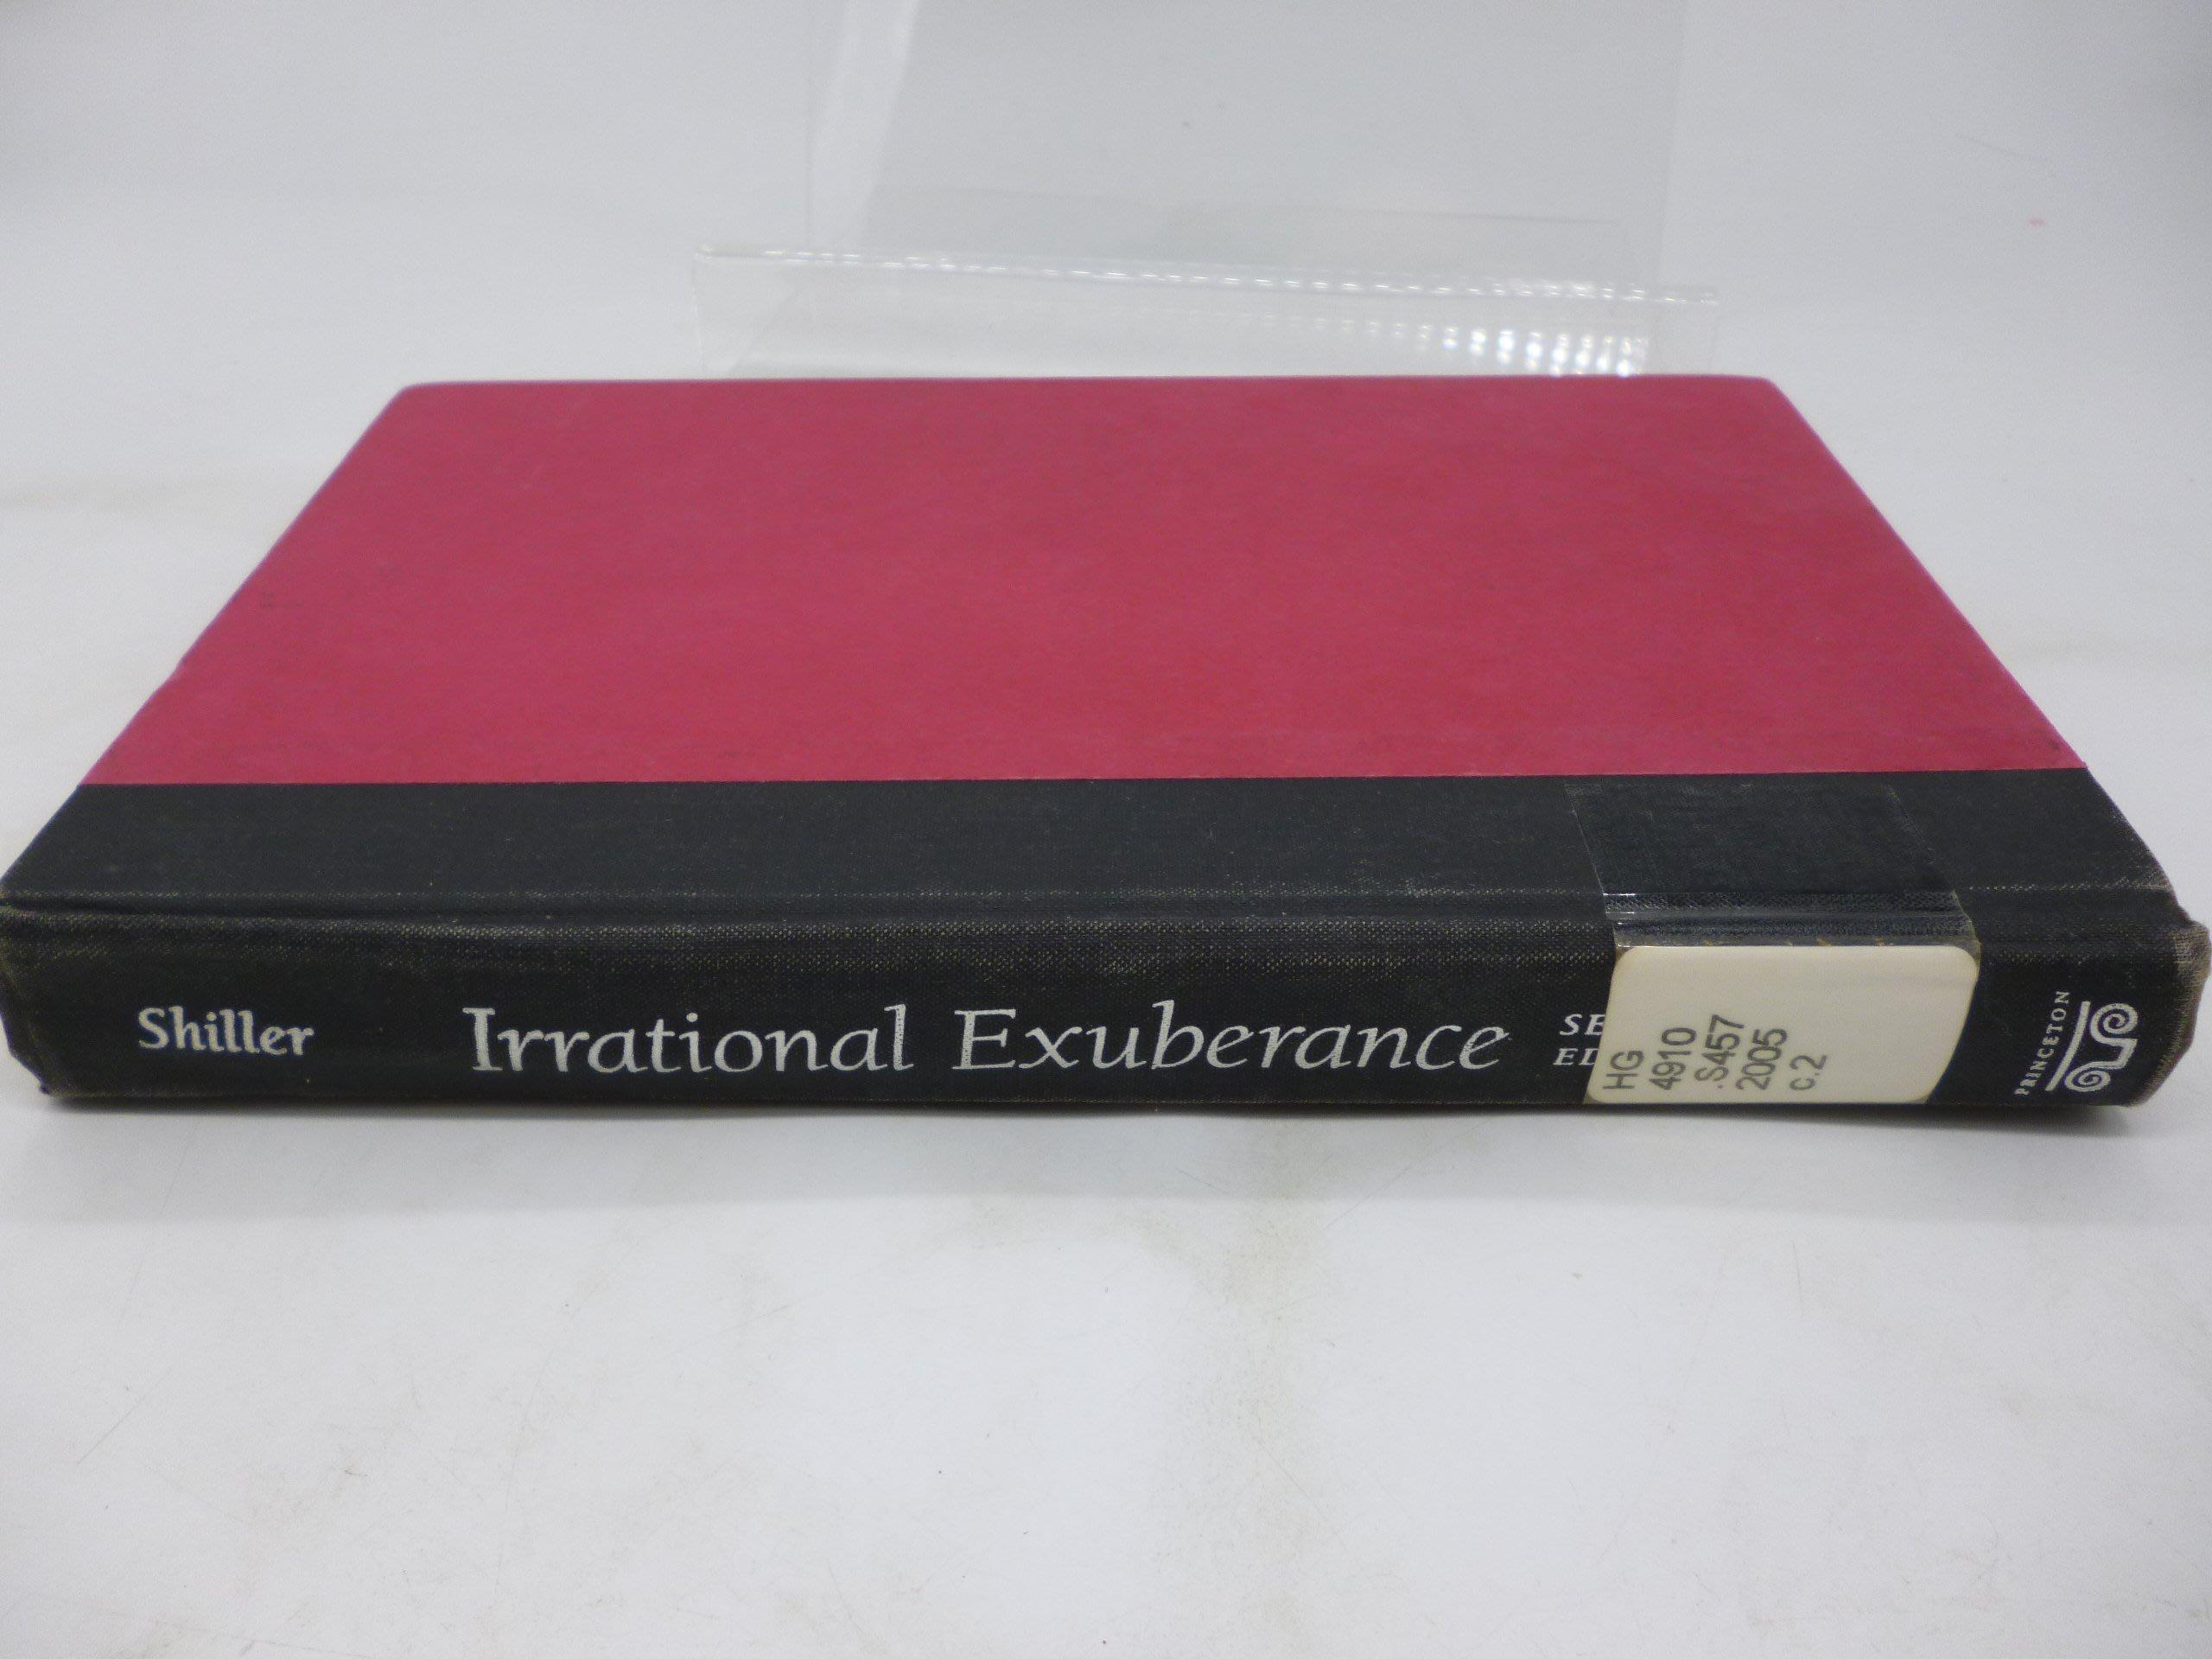 【月界】Irrational Exuberance_Robert J. Shiller_非理性繁榮 〖大學商學〗AGW